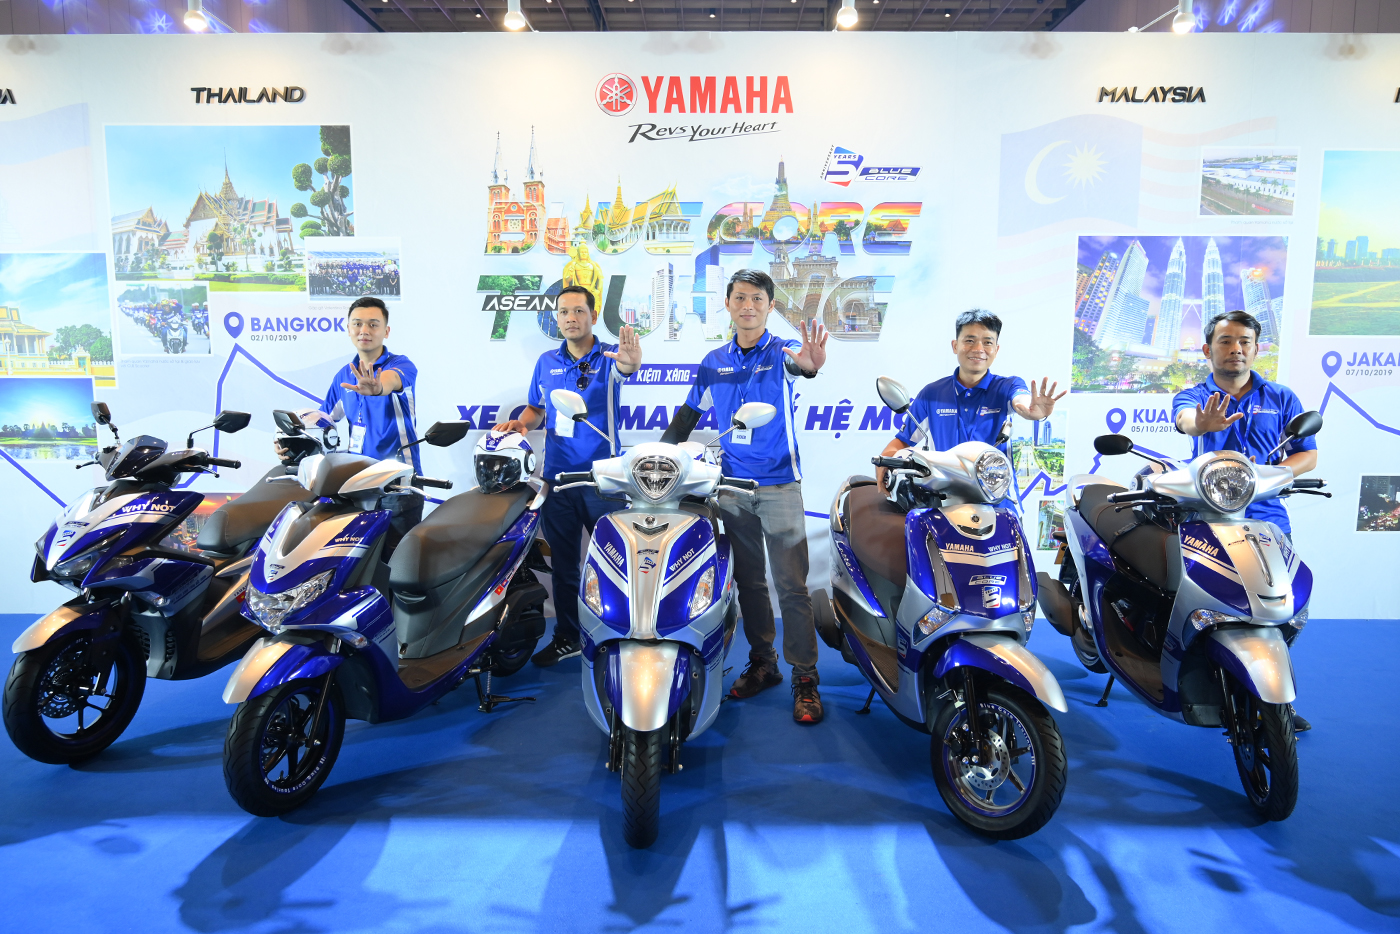 yamaha-motor-viet-nam-ky-niem-5-nam-dong-co-blue-core-va-hanh-trinh-asean-blue-core-touring-1.JPG